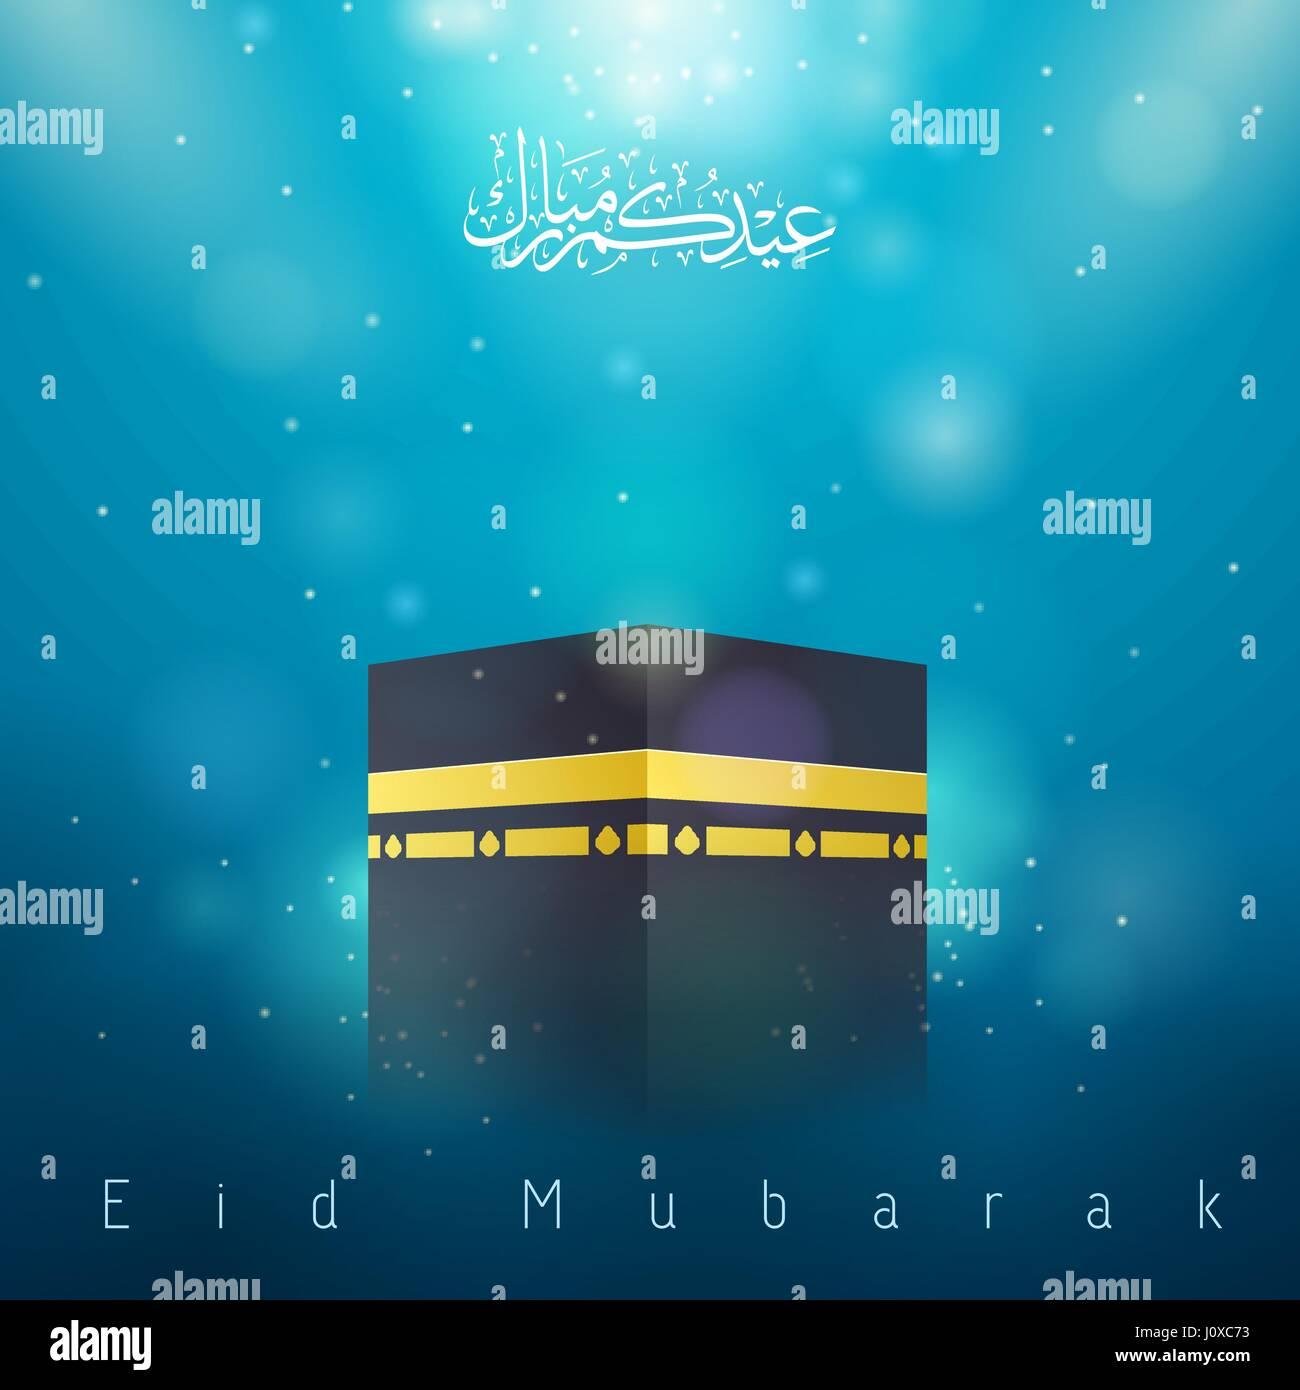 Eid mubarak kaaba islamic greeting stock vector art illustration eid mubarak kaaba islamic greeting m4hsunfo